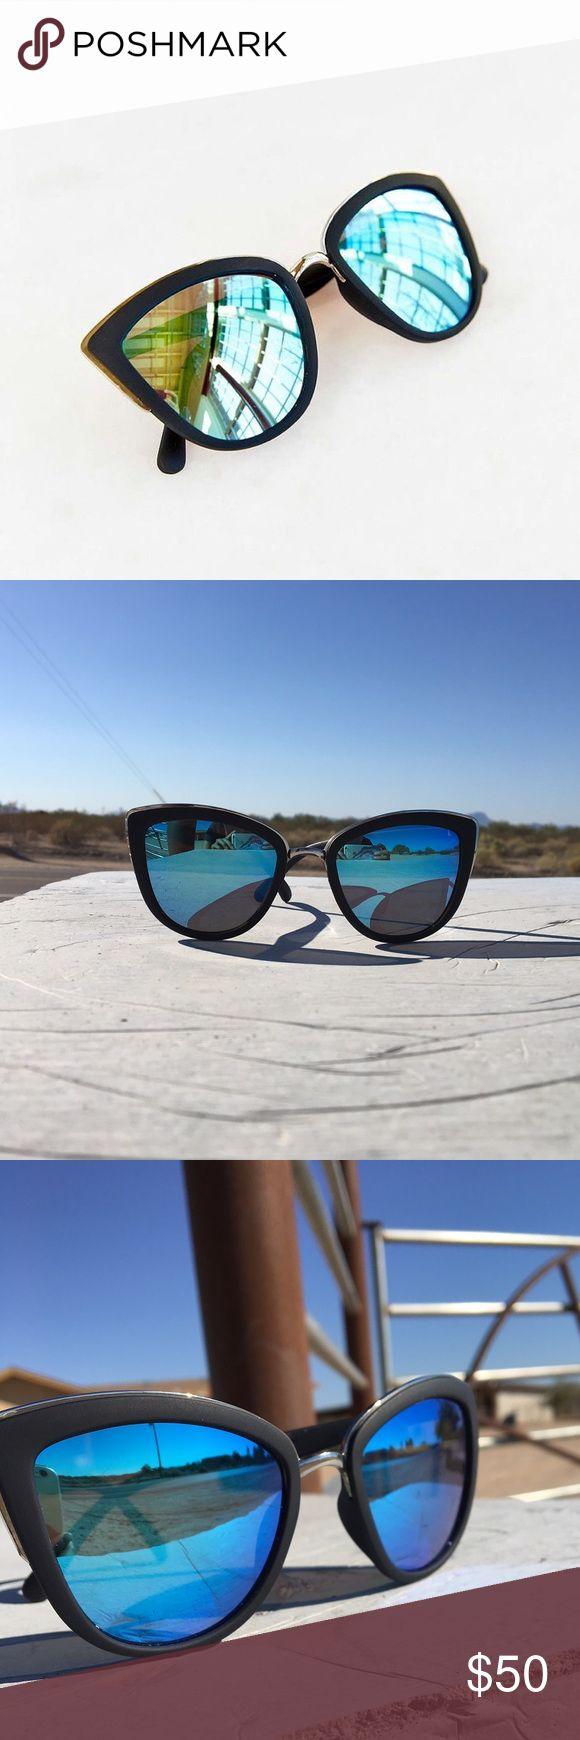 Quay sunglasses My girl blue mirrored ring quay glasses with case Quay Australia Accessories Sunglasses